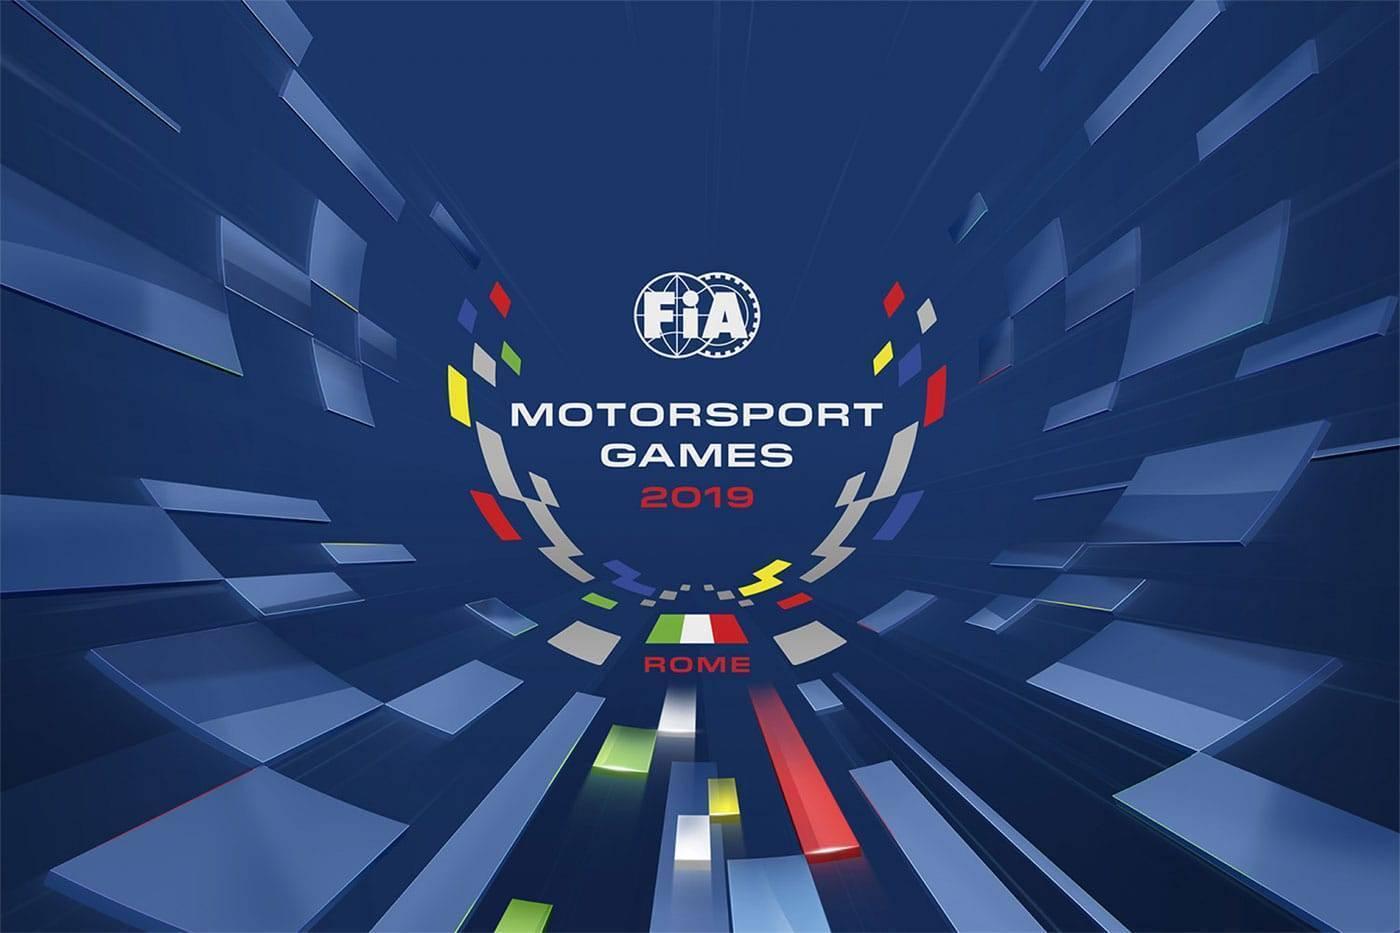 FIA-Motorsport-Games